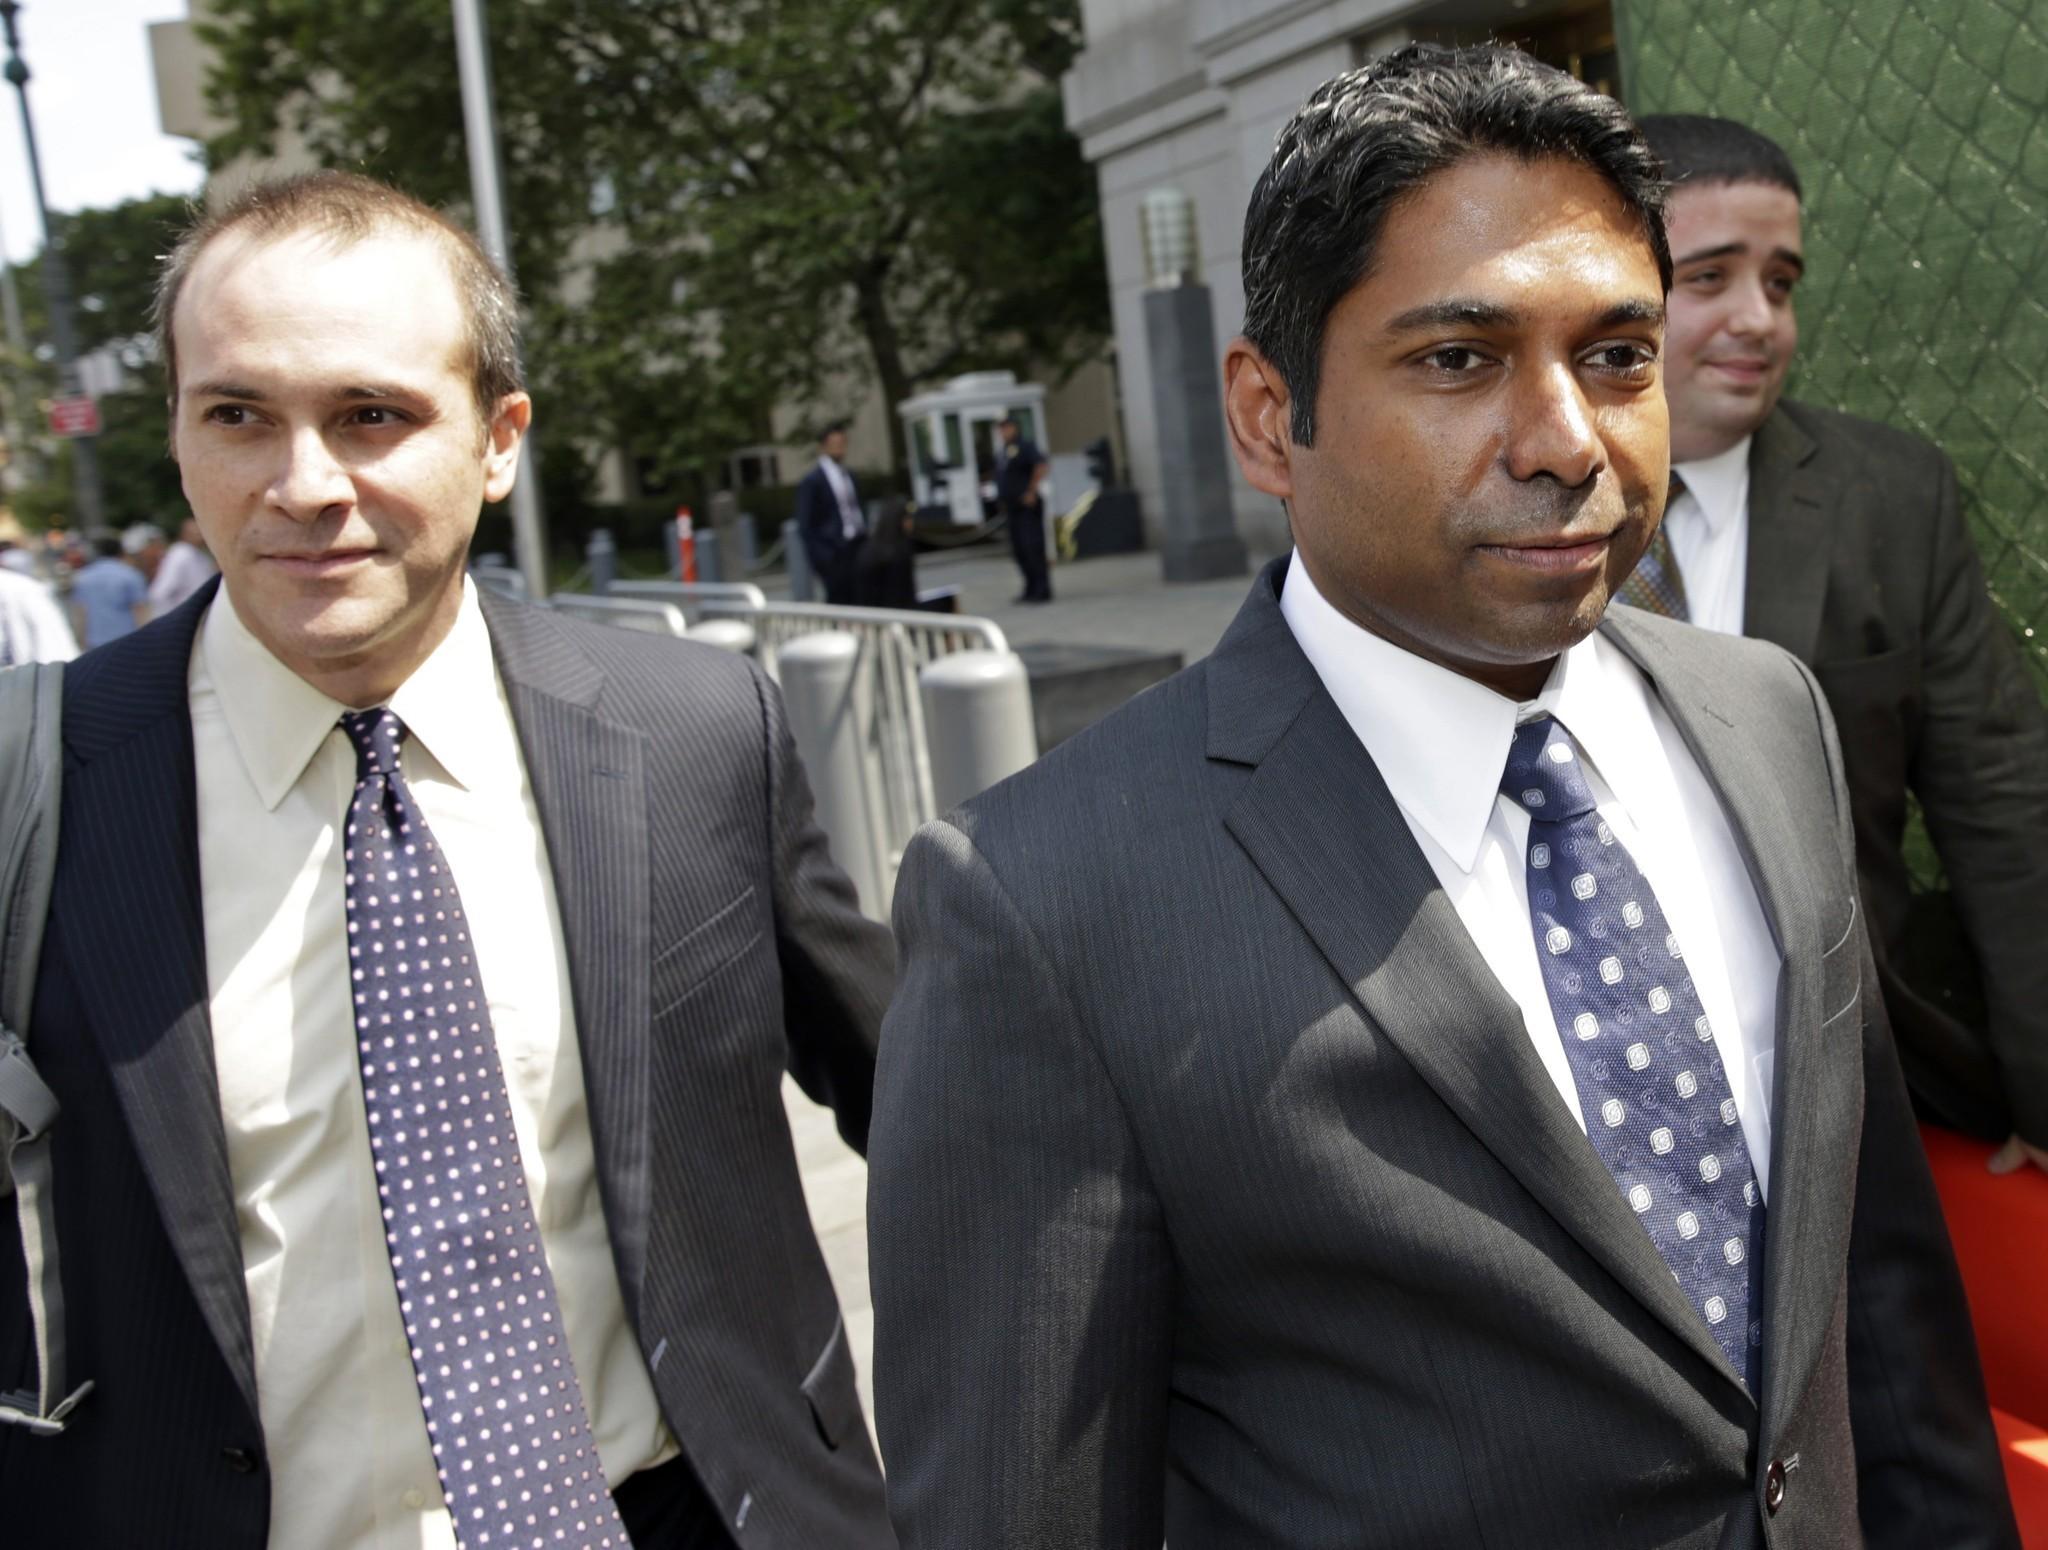 Raj Rajaratnam/Galleon Group, Anil Kumar, and Rajat Gupta insider trading cases